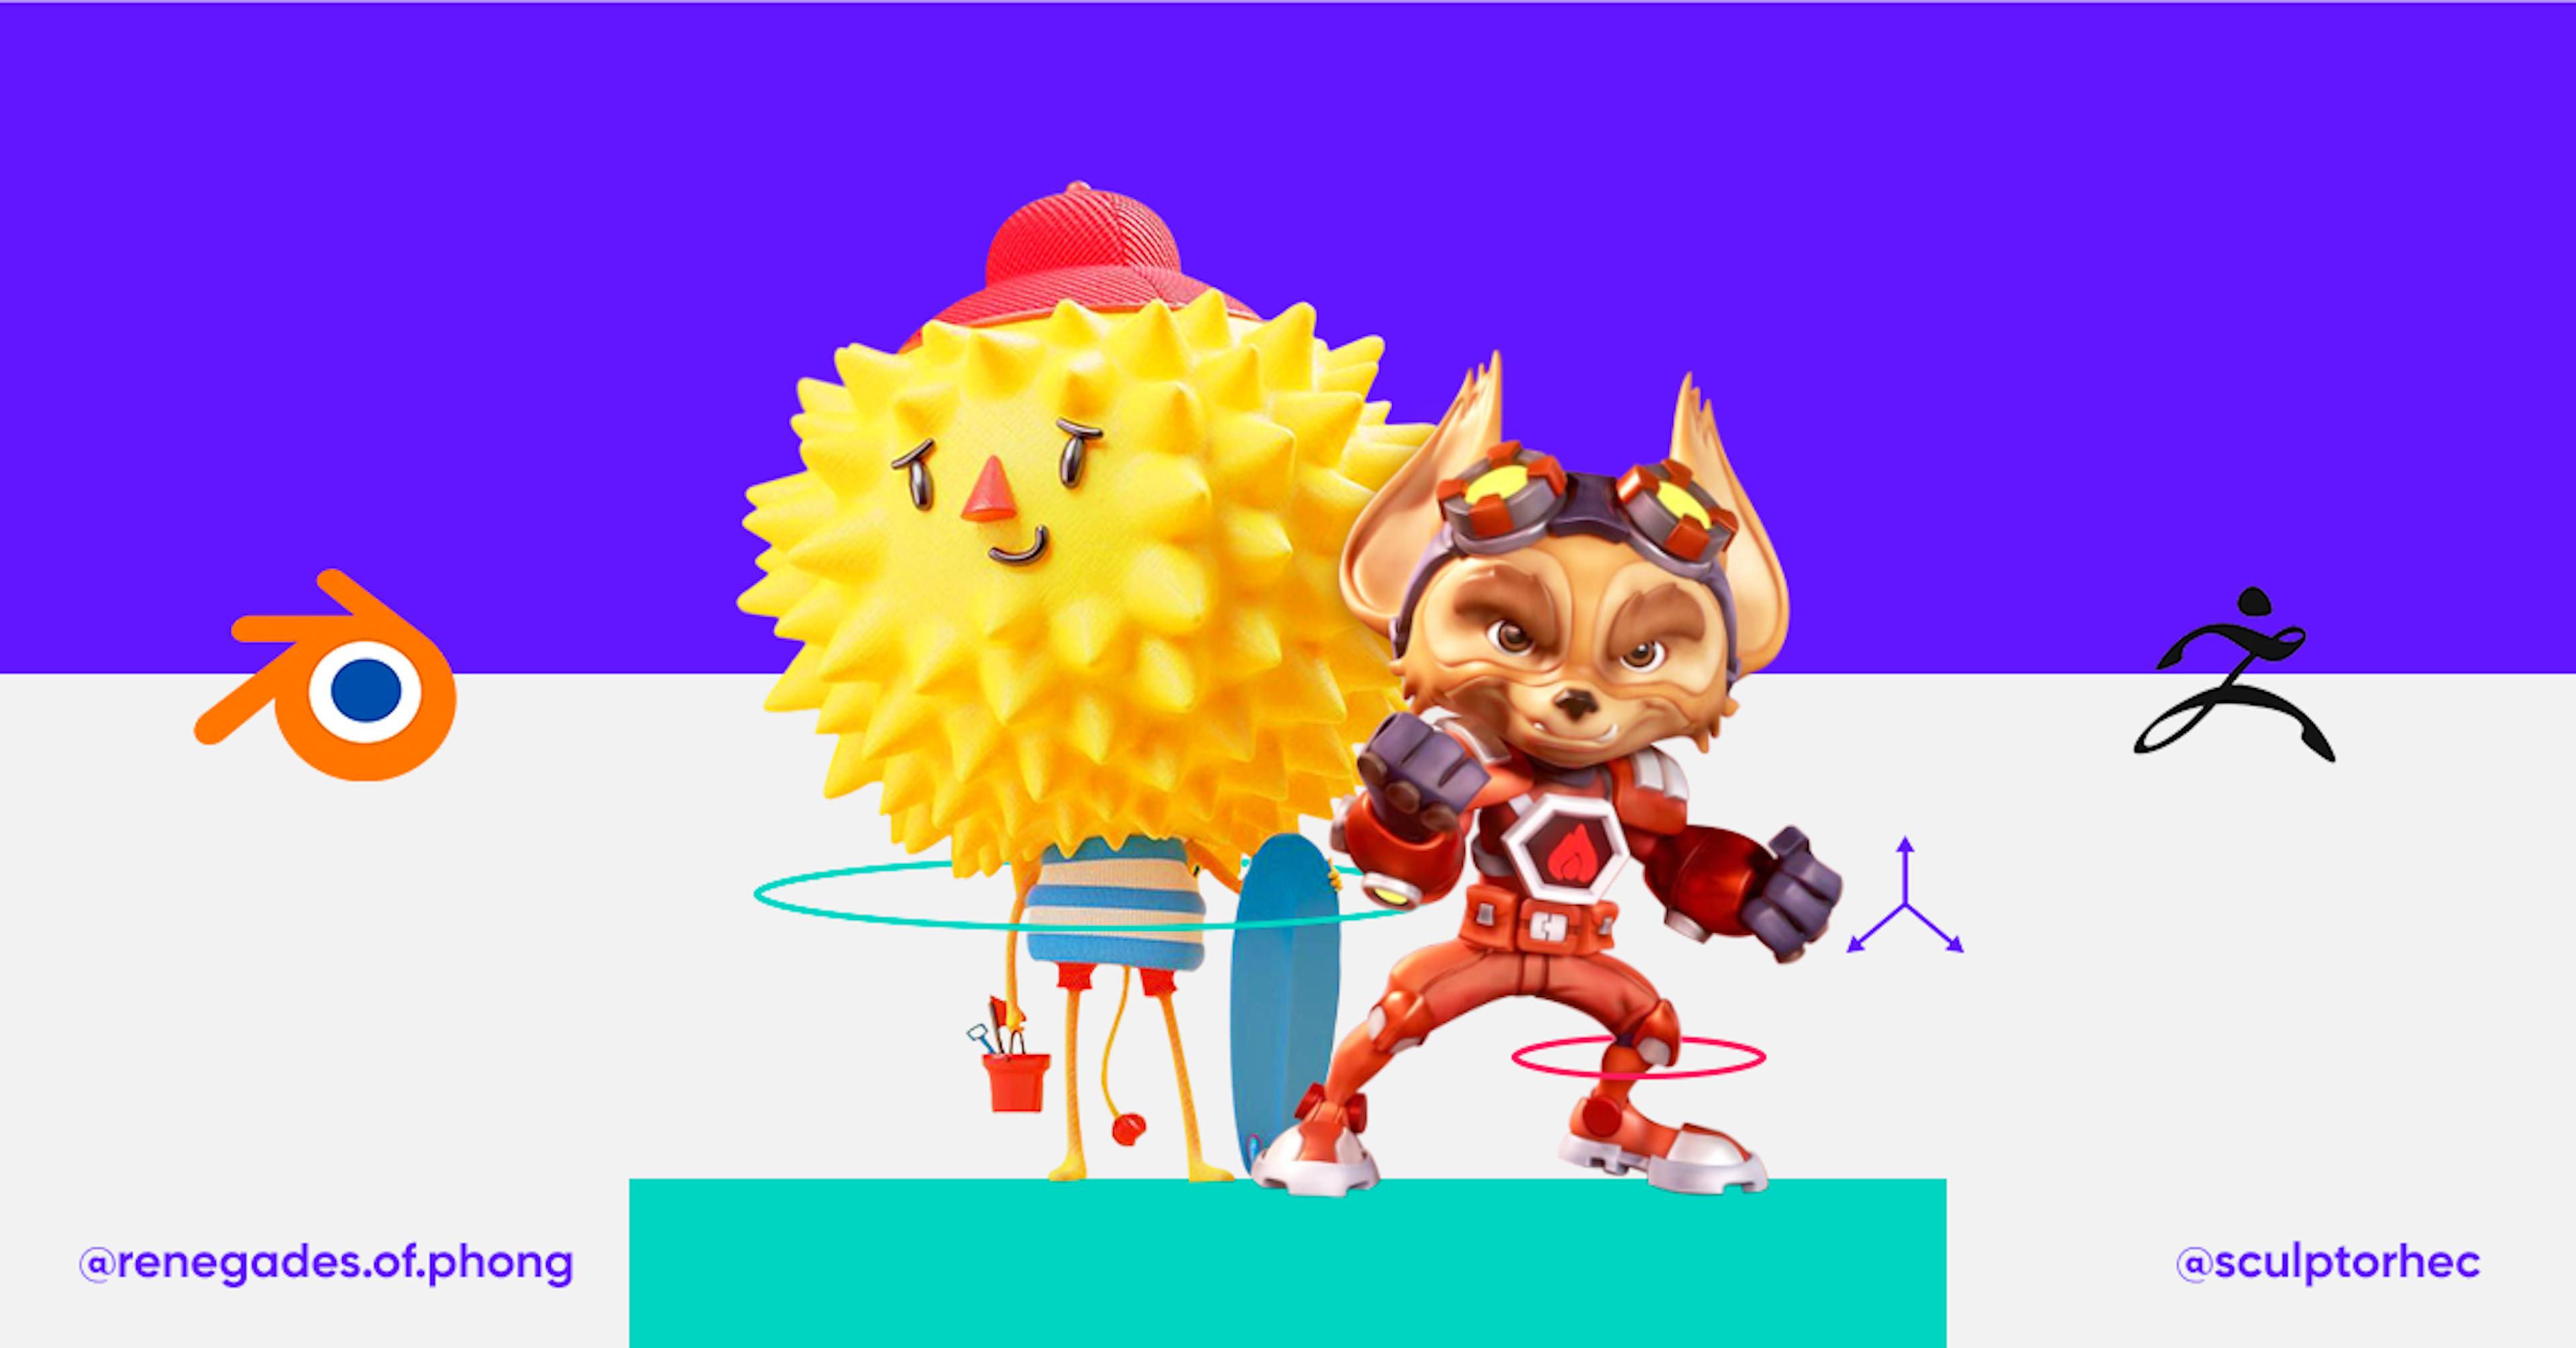 Versus de 3D: ¿Qué diferencias hay entre Blender vs Zbrush?